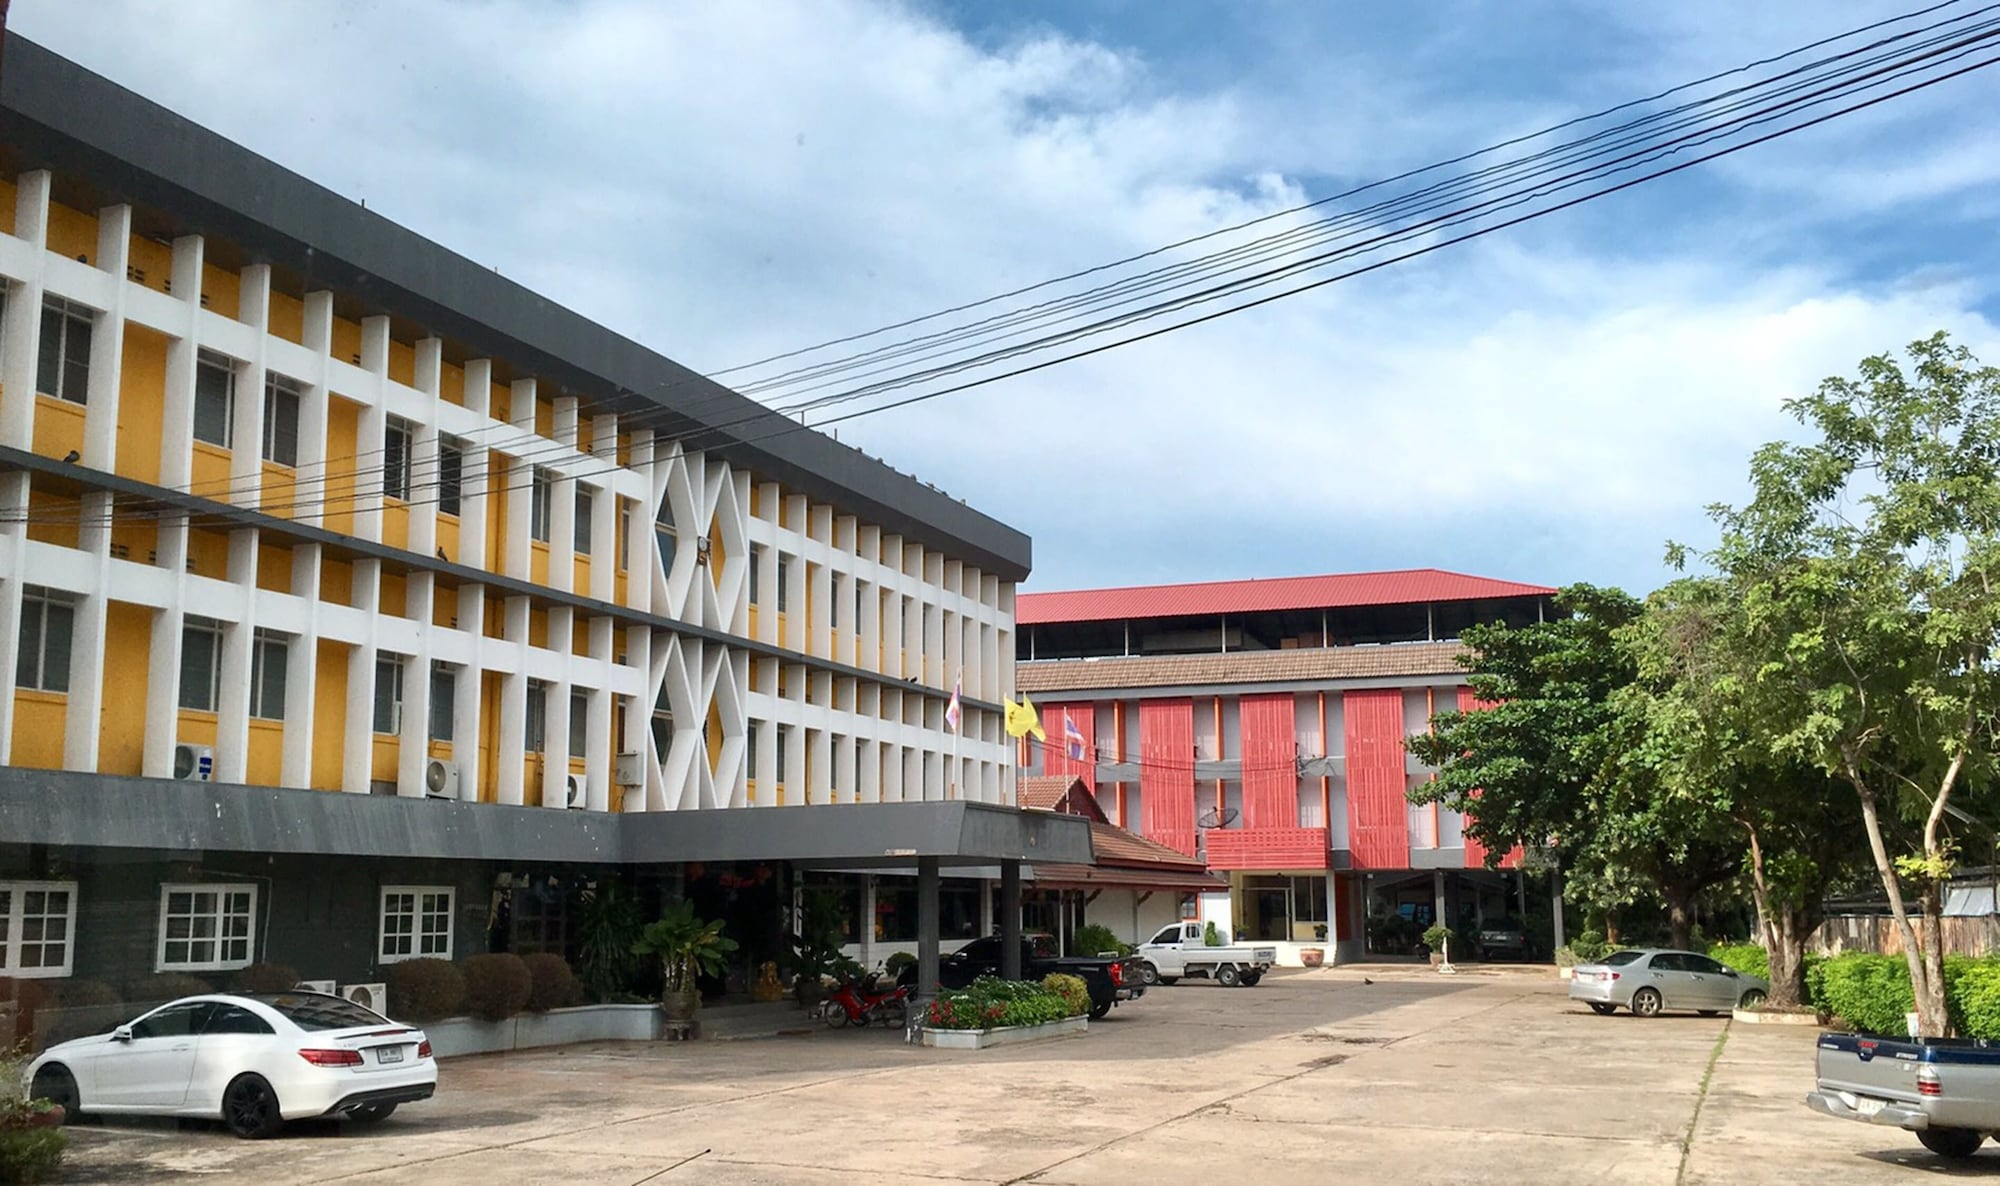 Montree Hotel, Muang Chai Nat